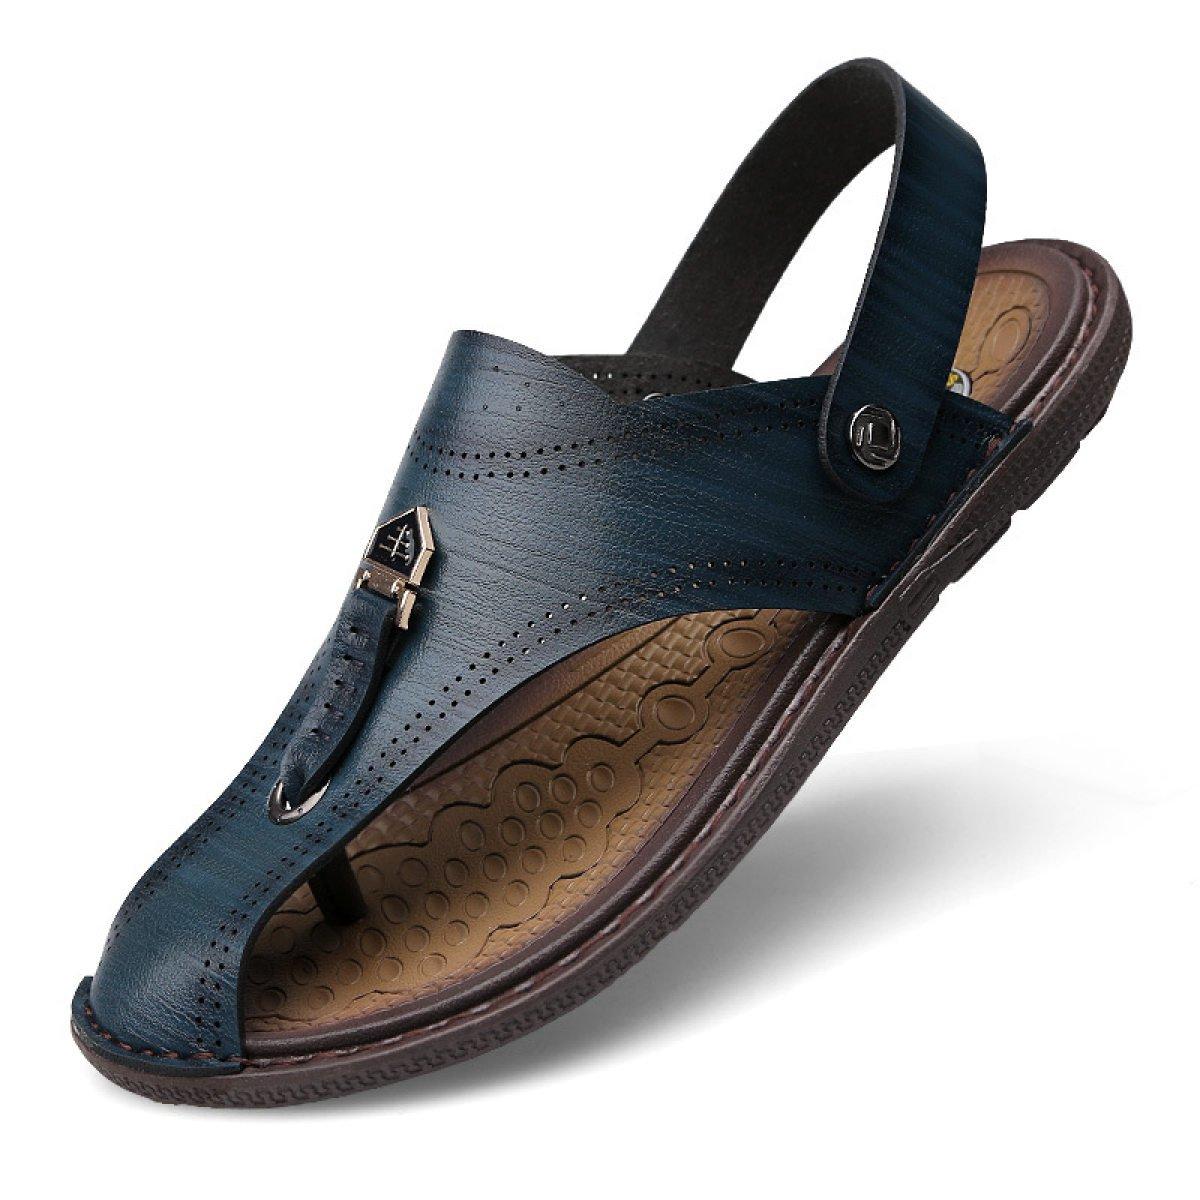 LXXAMens Verano Playa Hombre Zapatilla Peso Ligero Cuero Real Sandalias Zapatos Deportivos Al Aire Libre Dos Usos,Blue-41EU 41EU|Blue